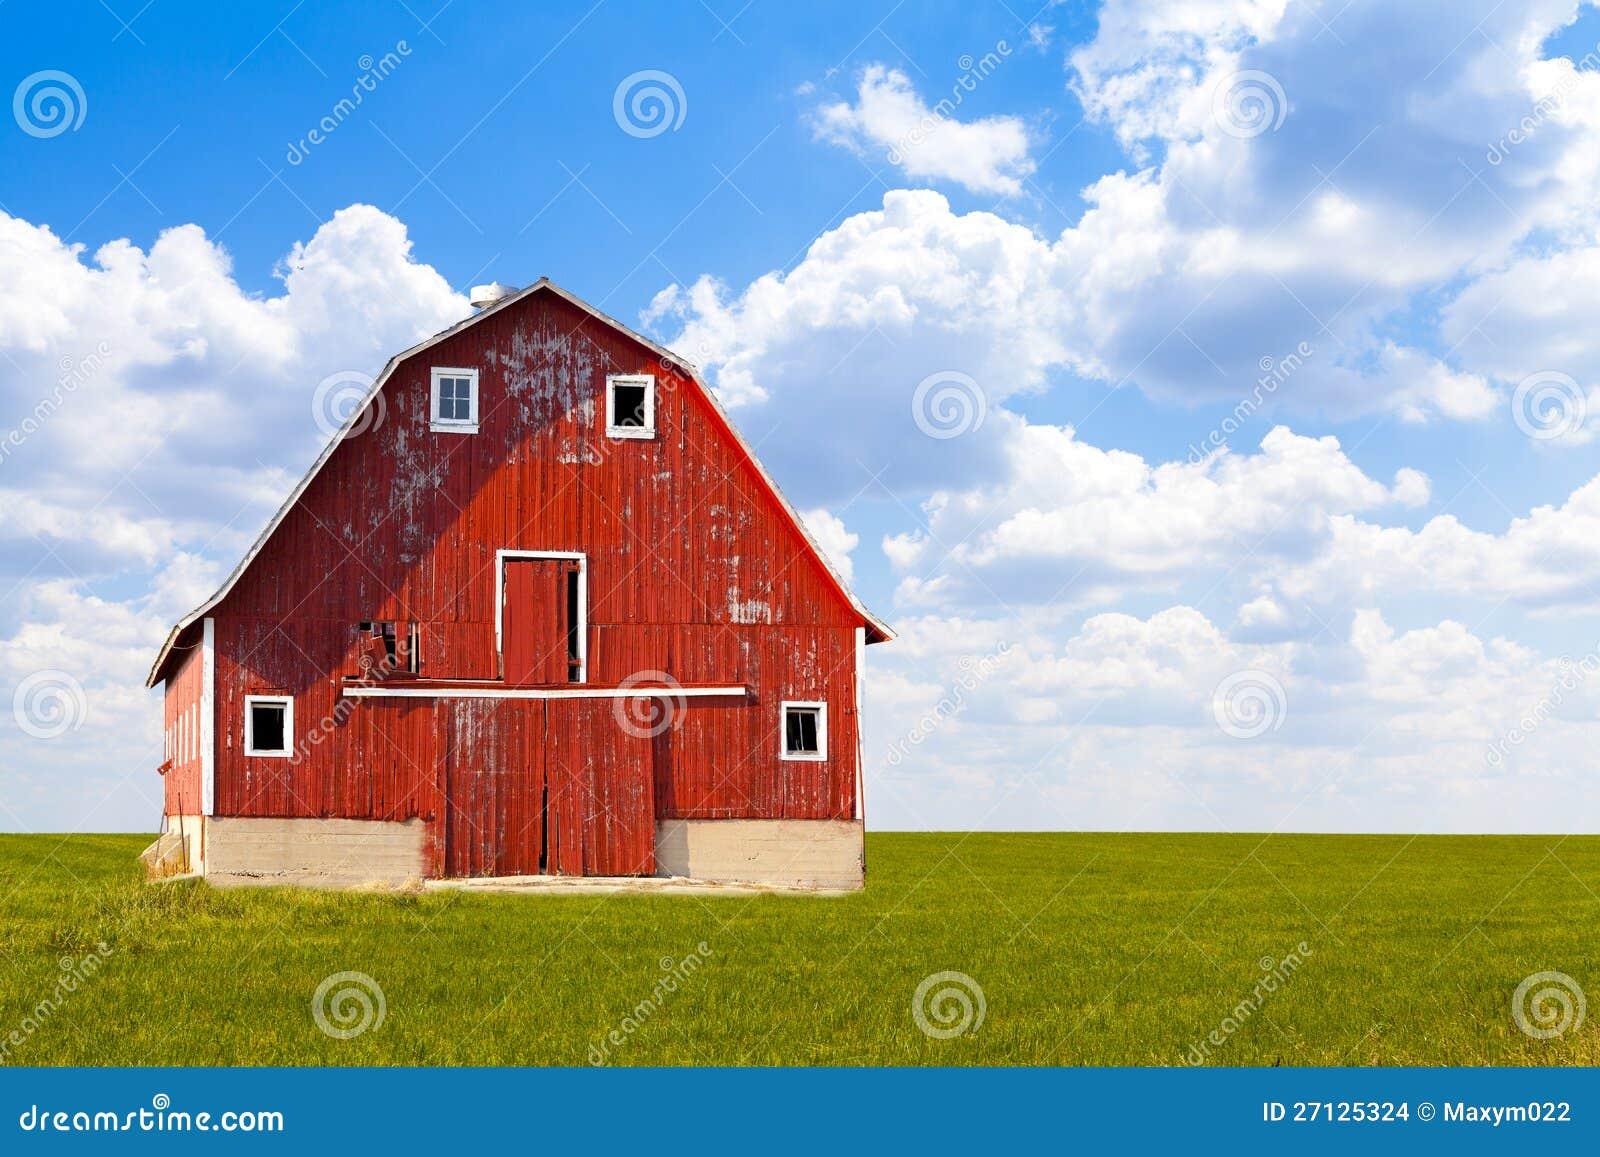 grange rouge am ricaine traditionnelle images stock image 27125324. Black Bedroom Furniture Sets. Home Design Ideas